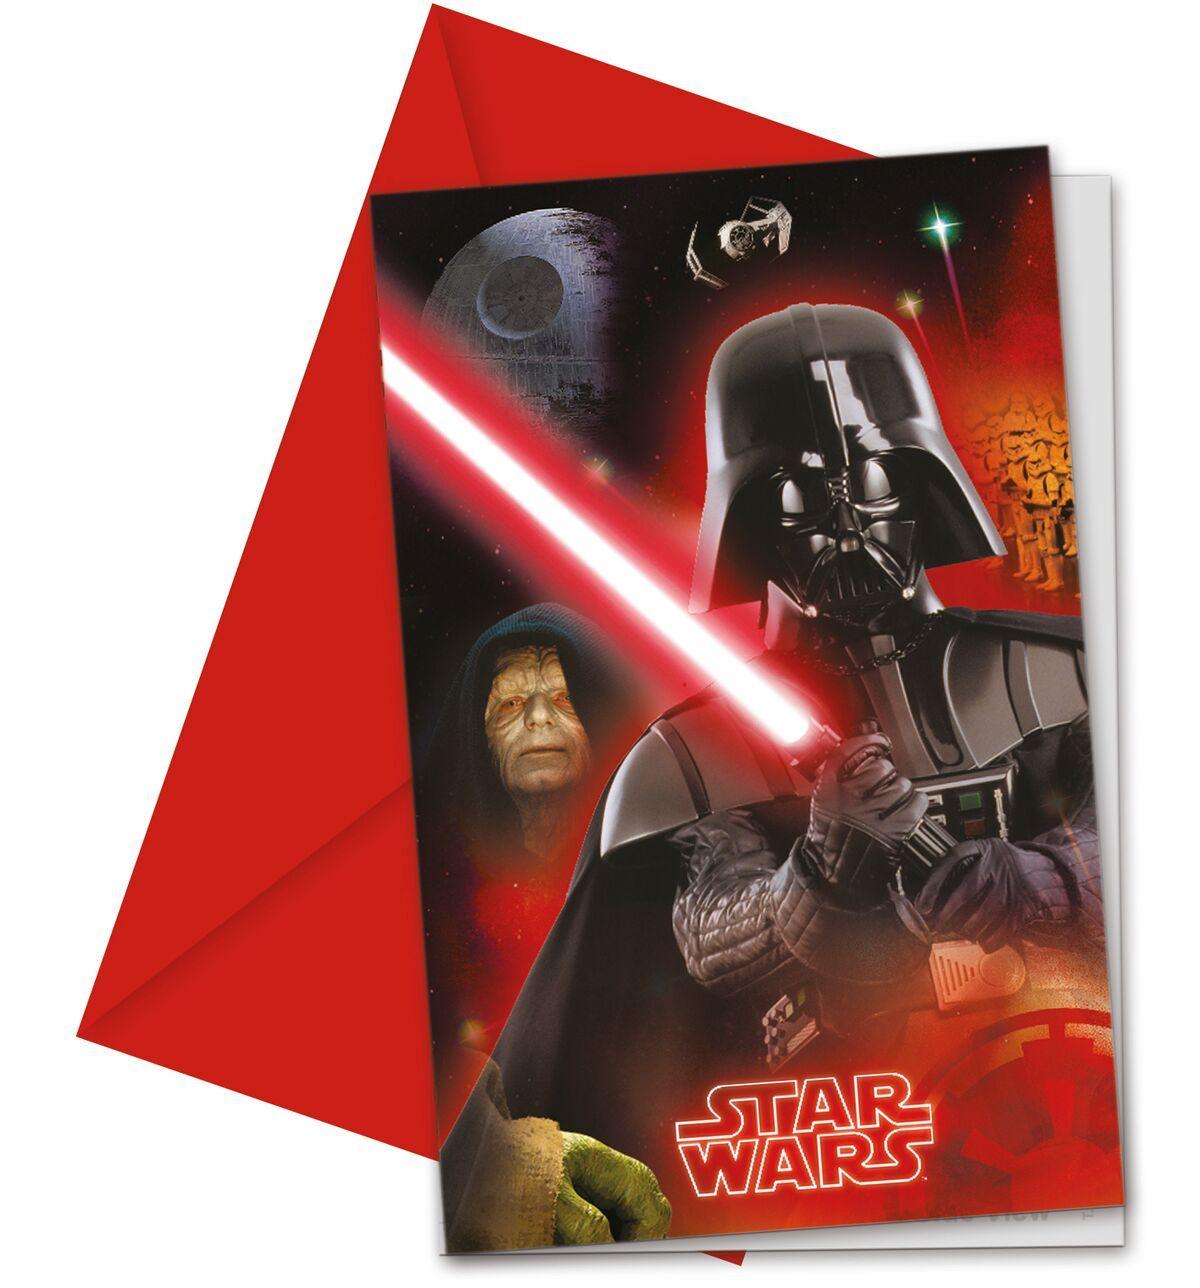 Star Wars Final Battle - kutsukortti